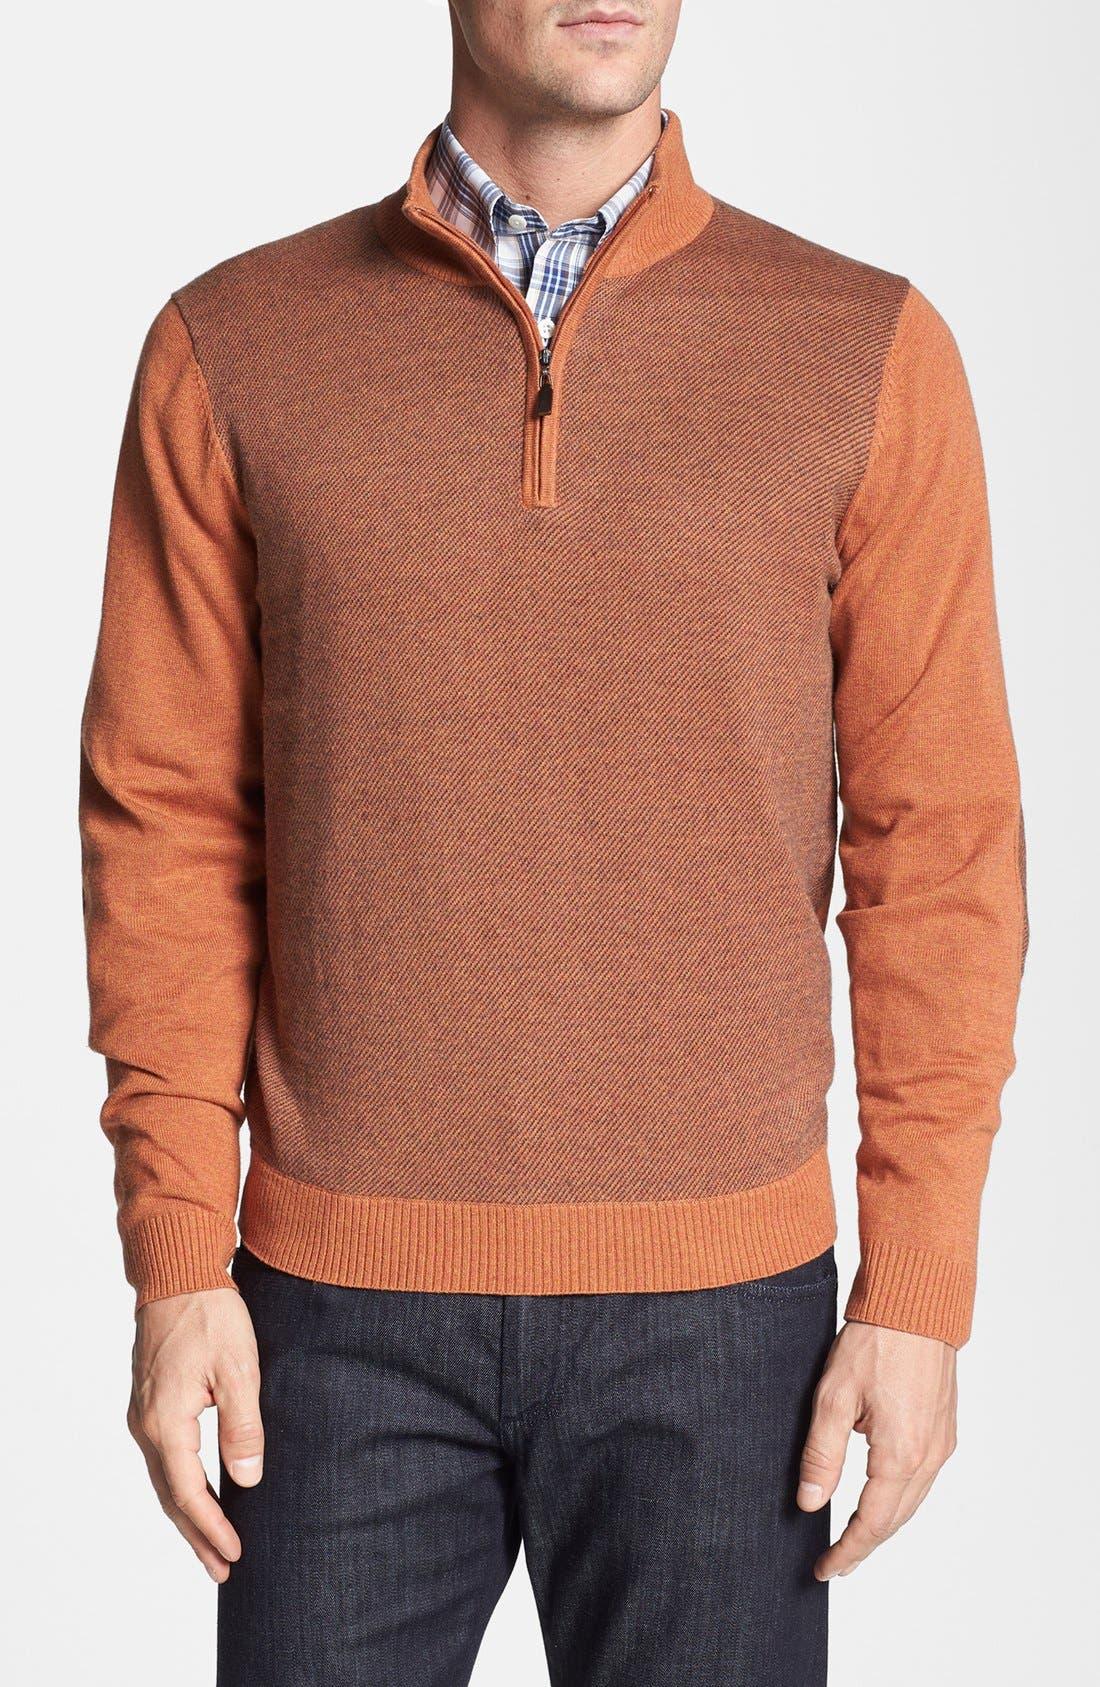 Main Image - Robert Talbott Jacquard Quarter Zip Sweater